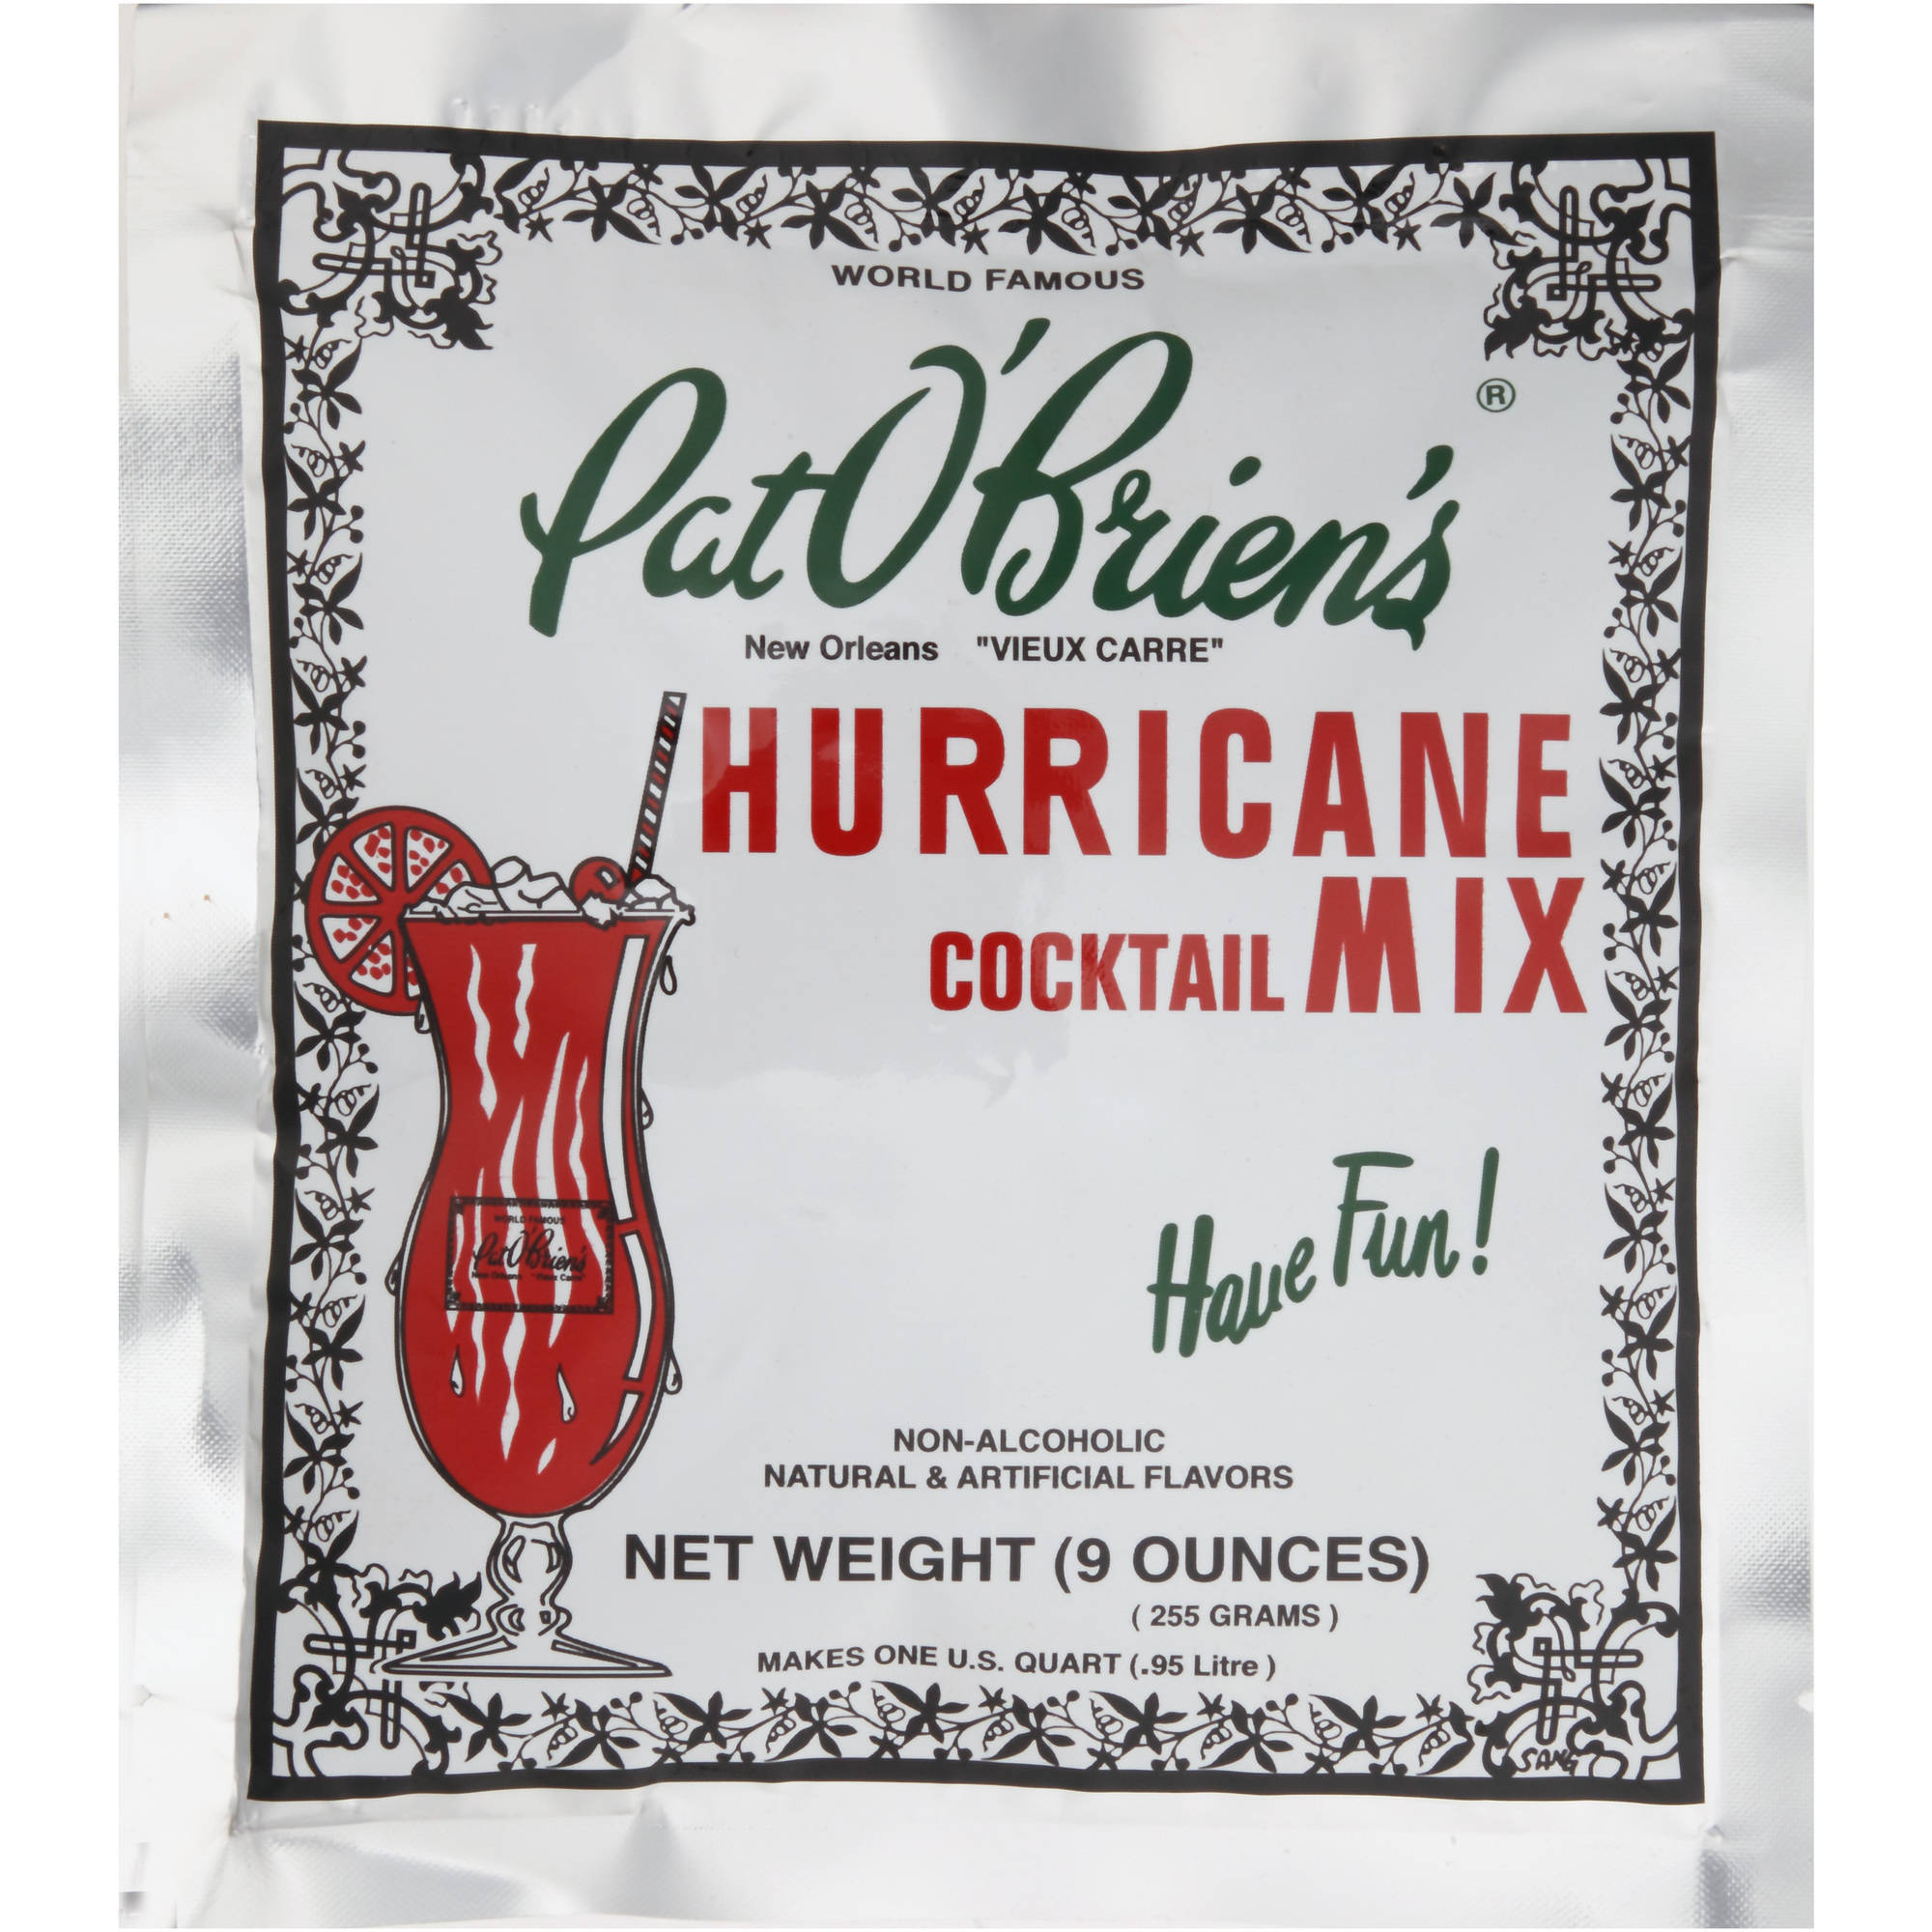 Pat O'Brien's Hurricane Cocktail Mix, 9 oz by Franco's Cocktail Mixes